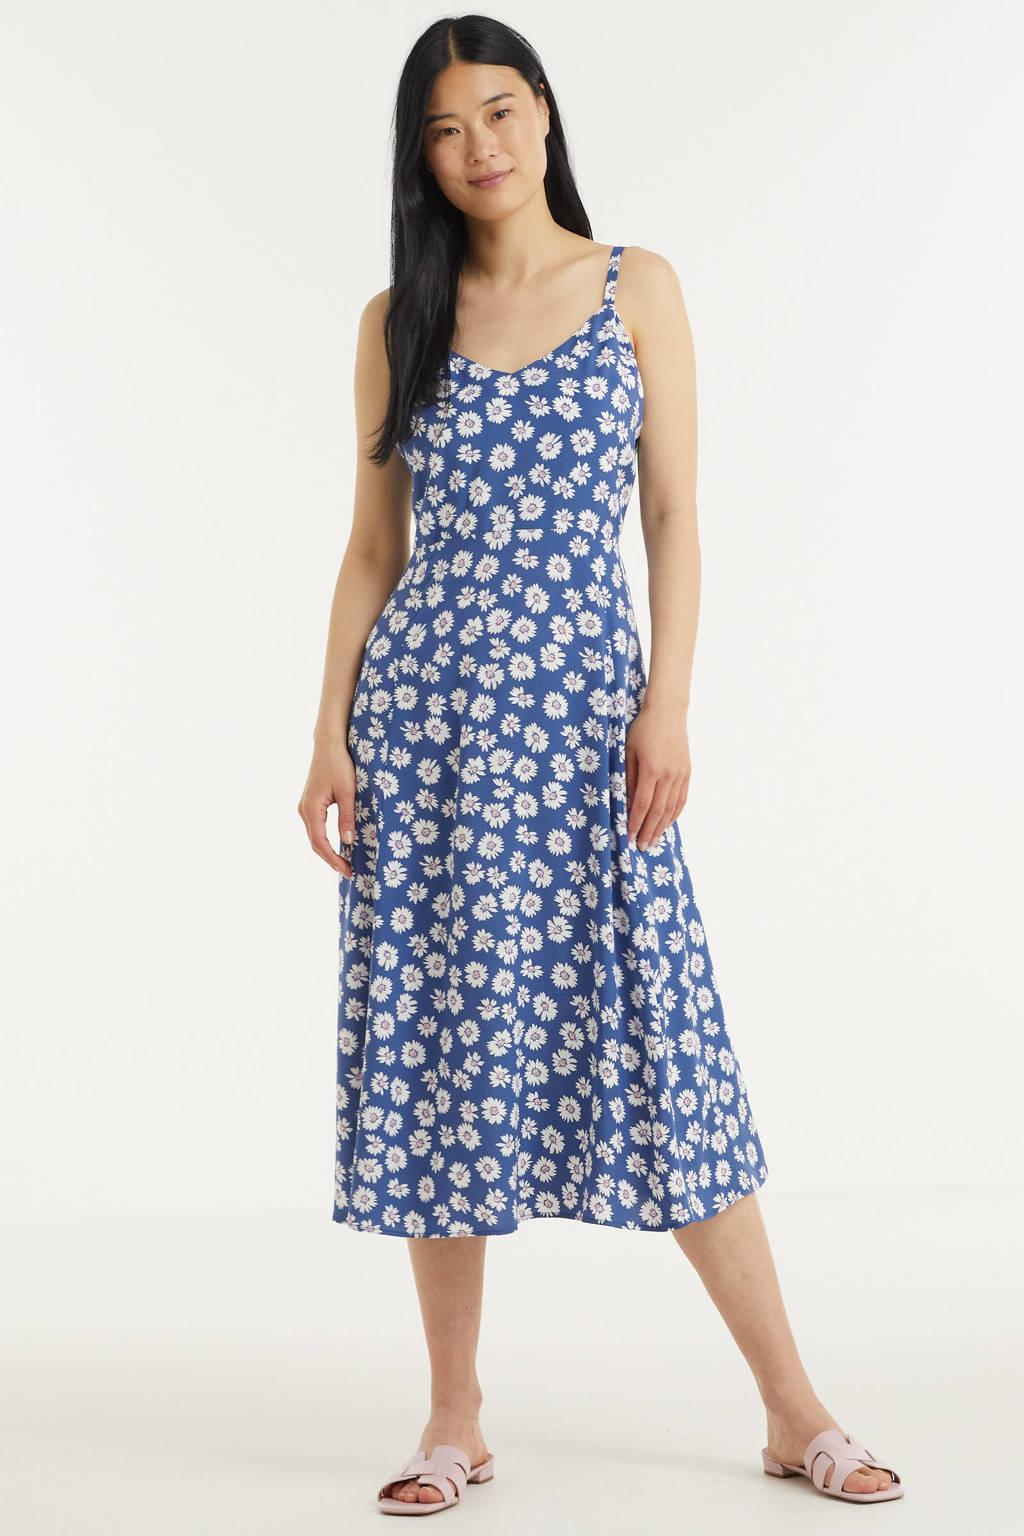 GAP gebloemde A-lijn jurk blauw, Blauw